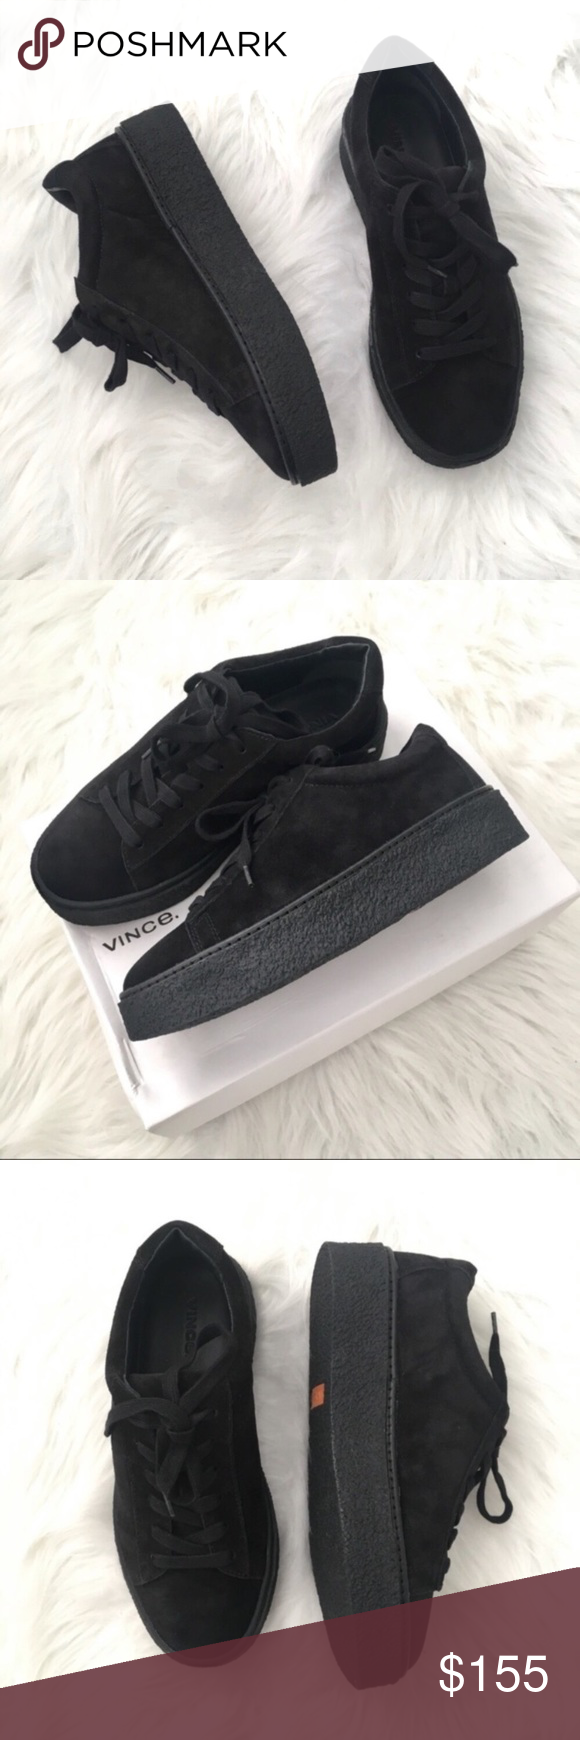 289d35a961b NIB VINCE Neela black suede platform sneakers NIB Vince black suede Neela  platform sneakers